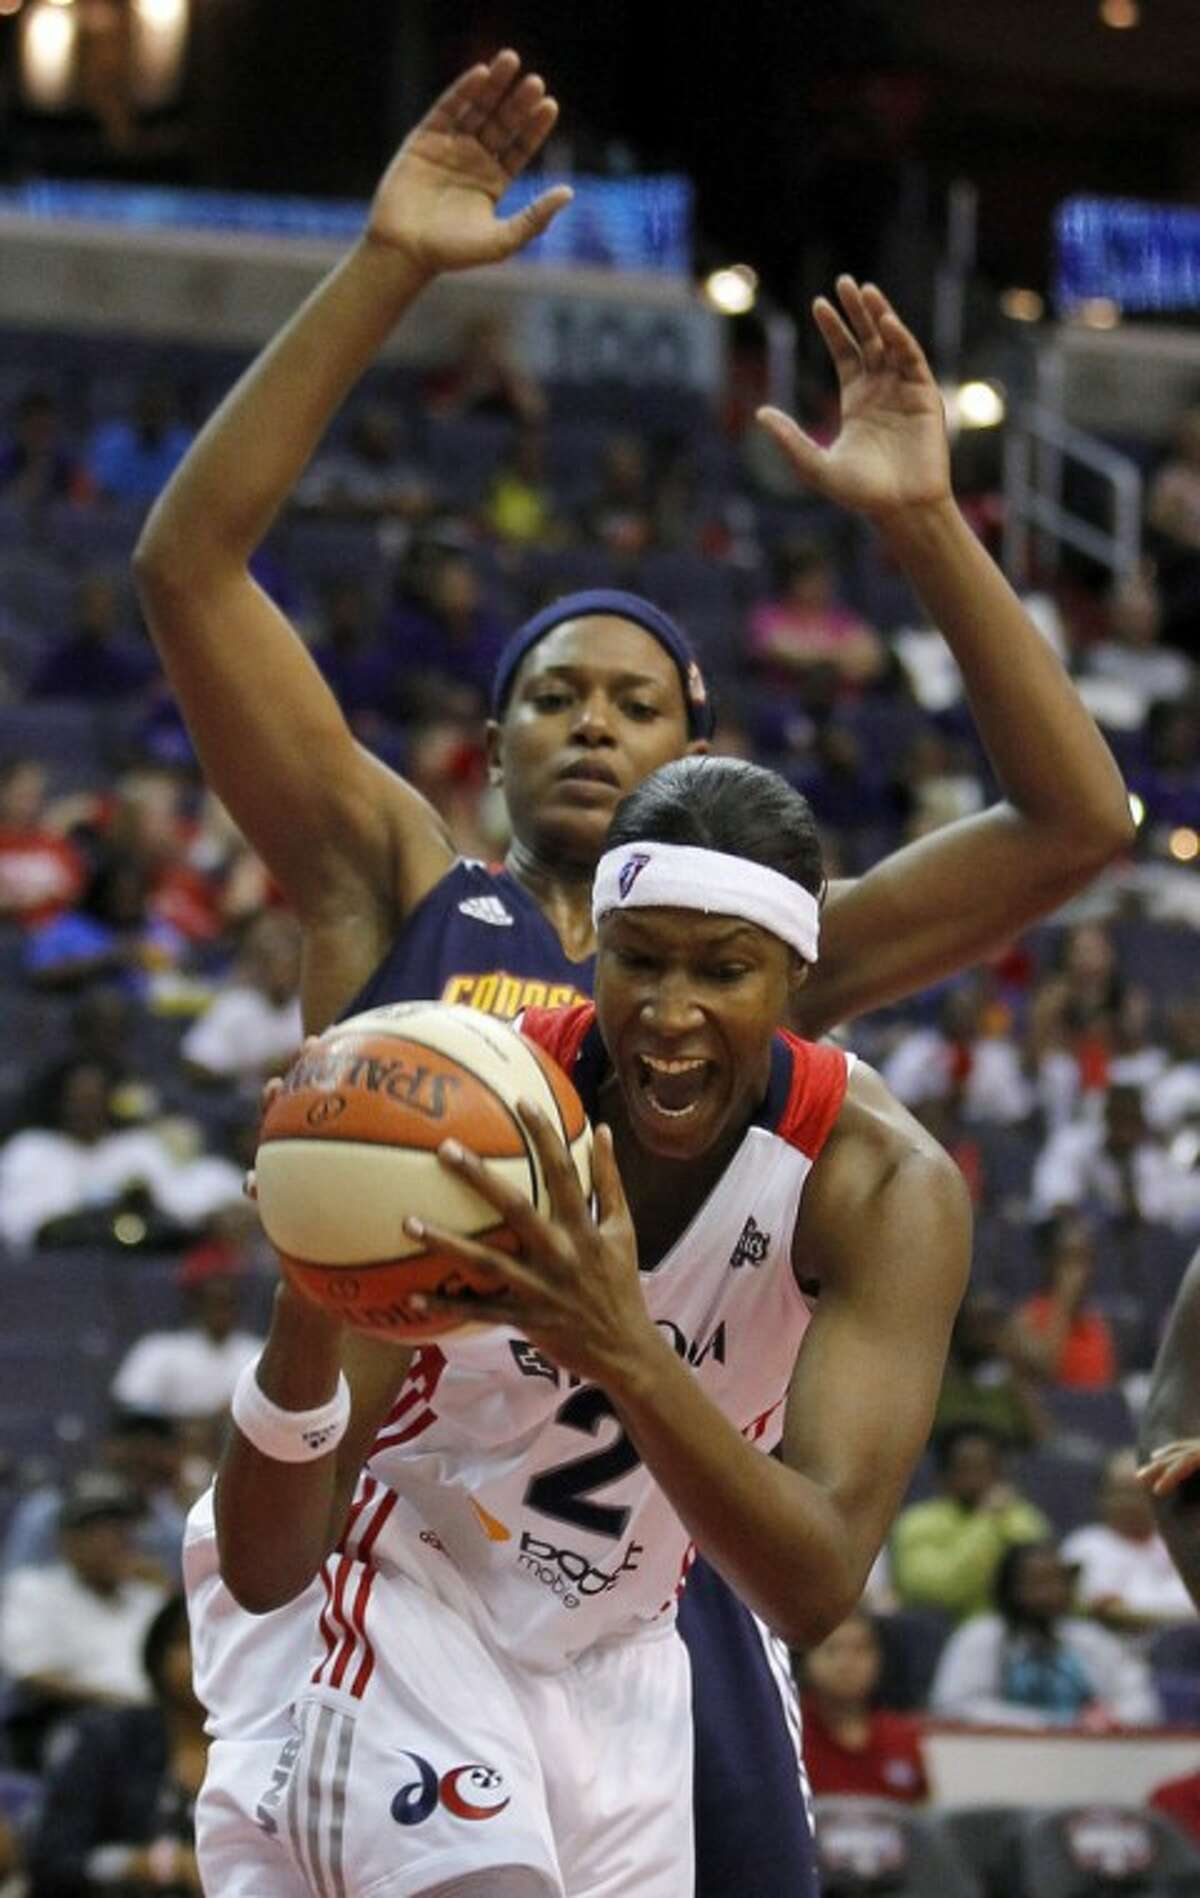 Washington Mystics center Michelle Snow (2) grabs a rebound in front of Connecticut Sun forward Asjha Jones (15) during the first half of a WNBA basketball game Tuesday, July 10, 2012 in Washington. (AP Photo/Alex Brandon)